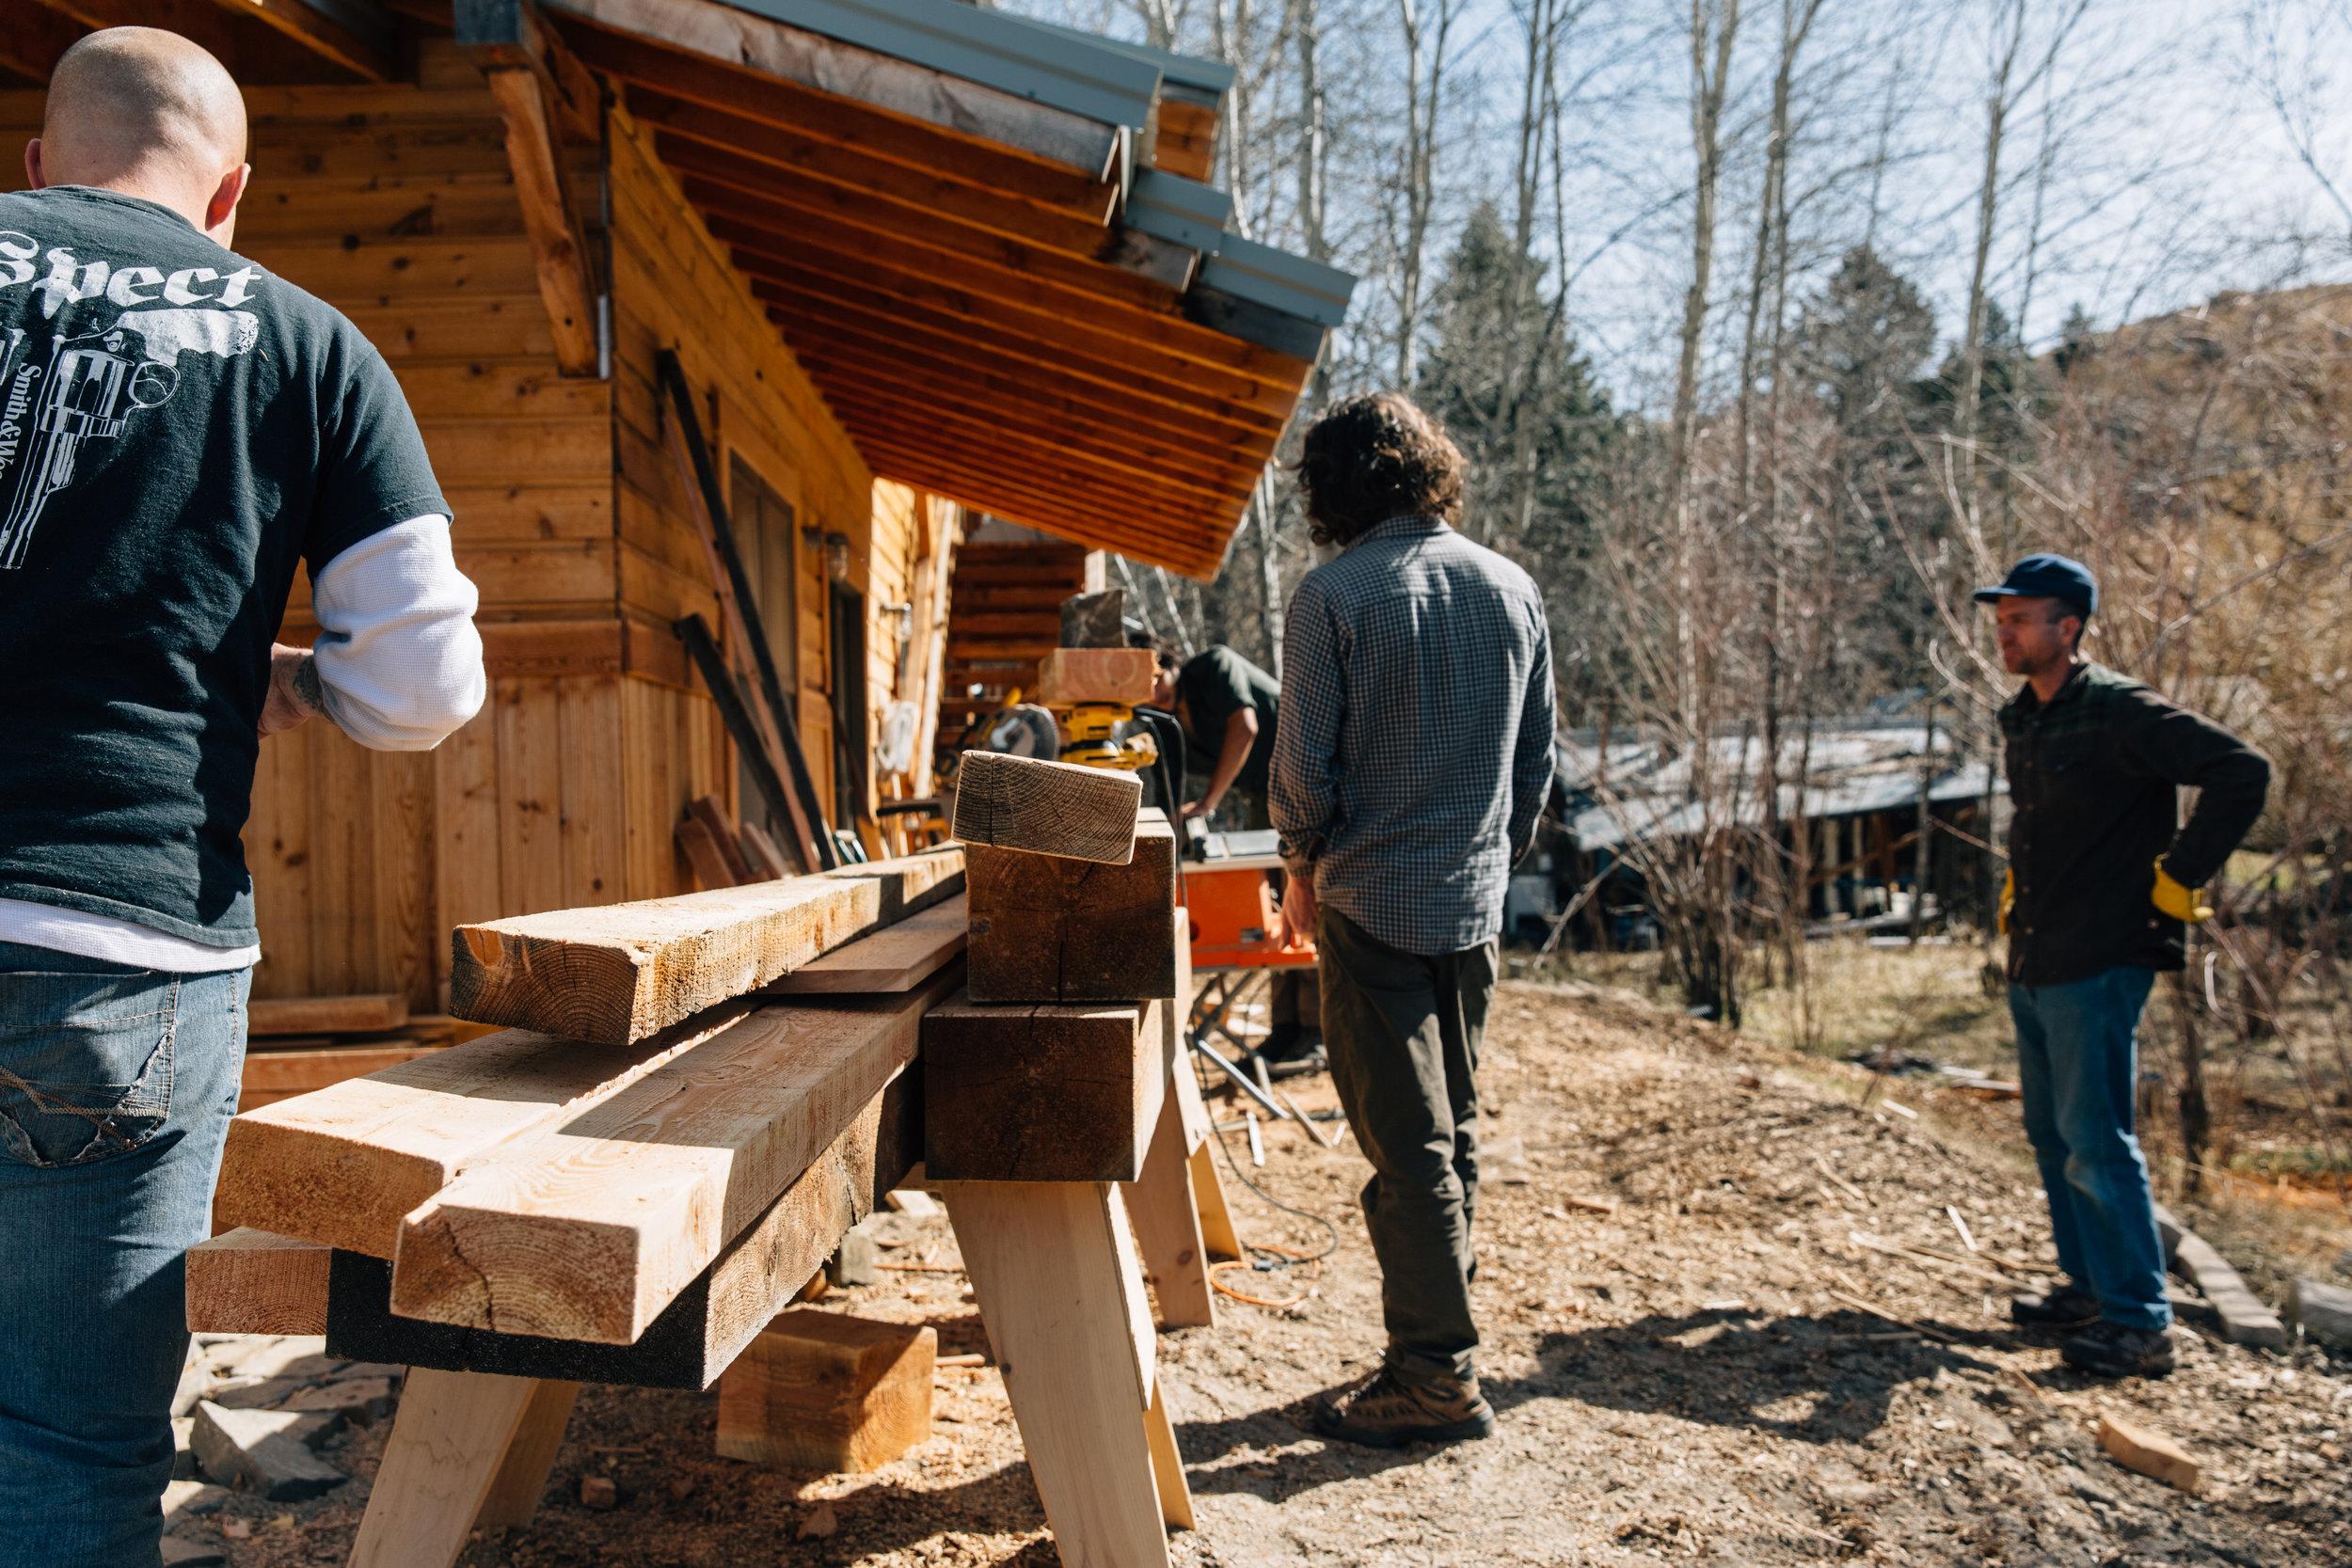 Montana_03_24_17-95-BLOG-FB.jpg